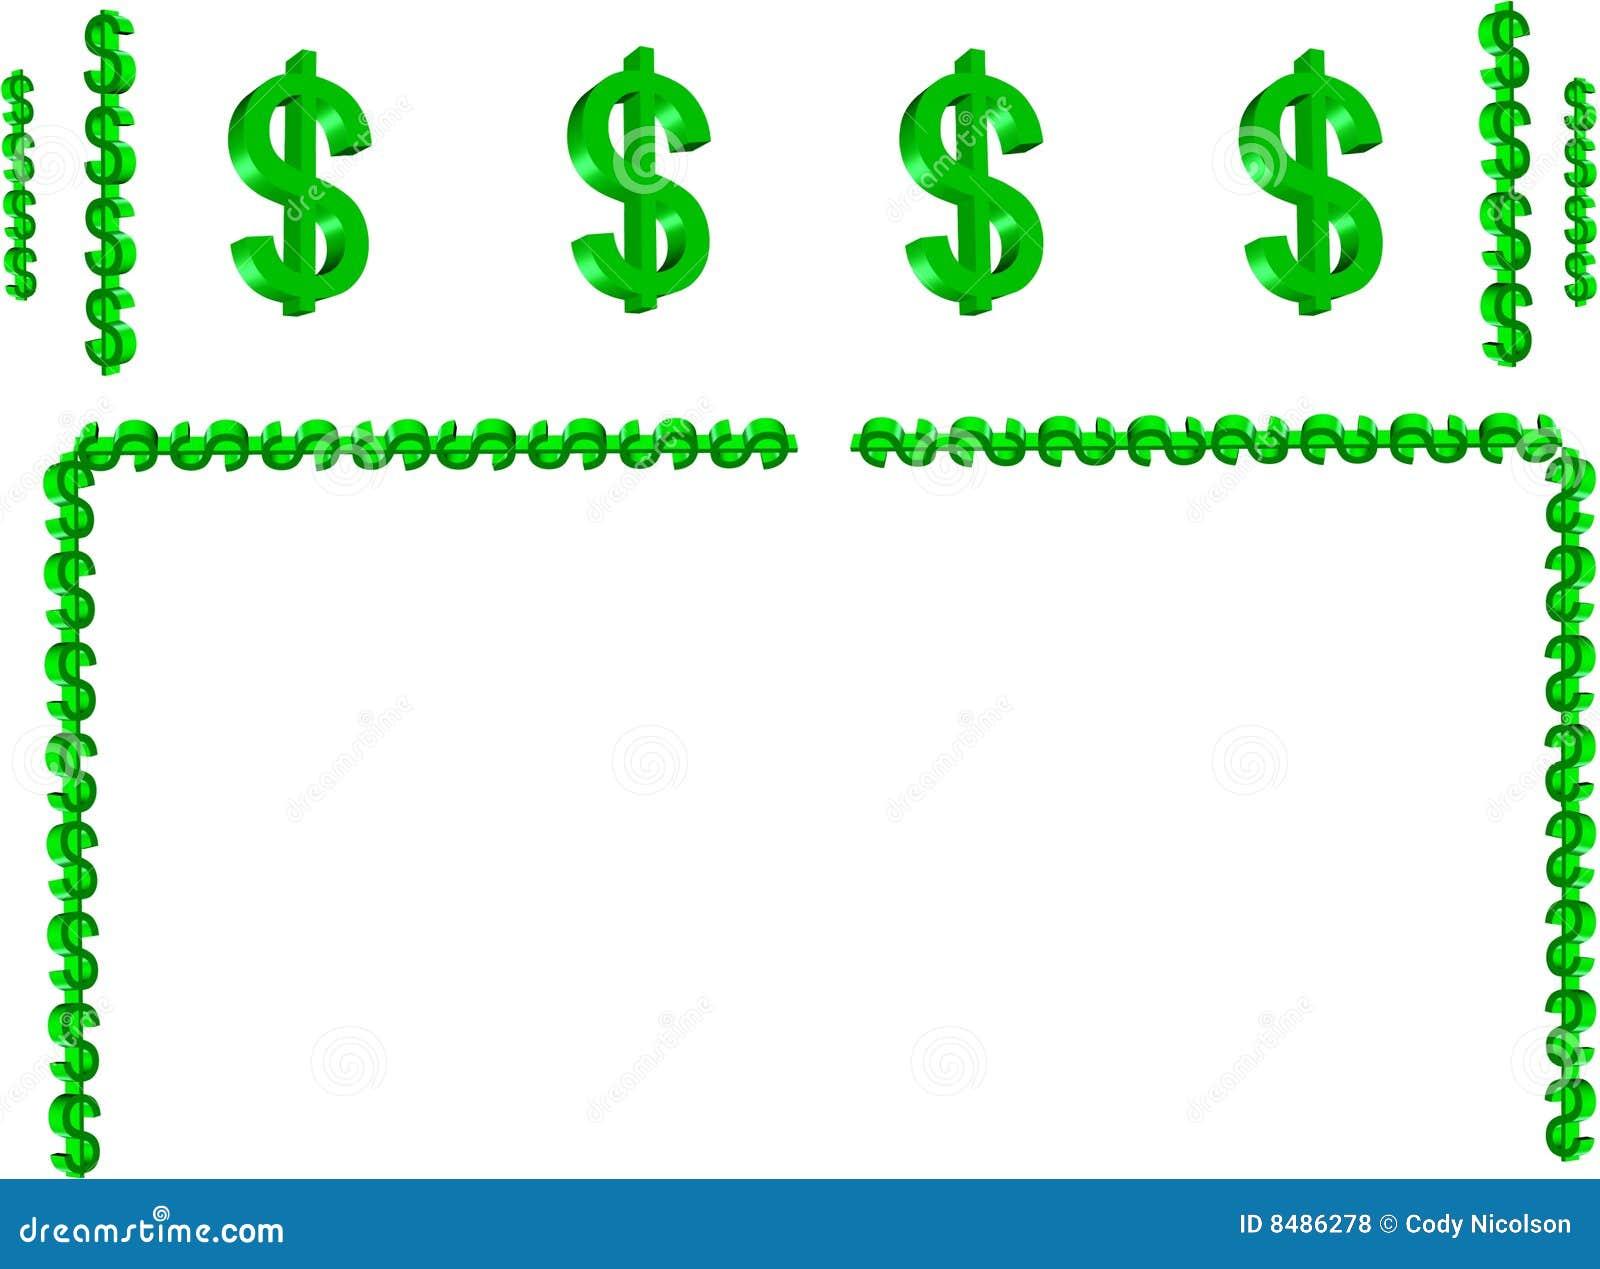 Money symbol border in 3d stock illustration illustration of money symbol border in 3d biocorpaavc Images